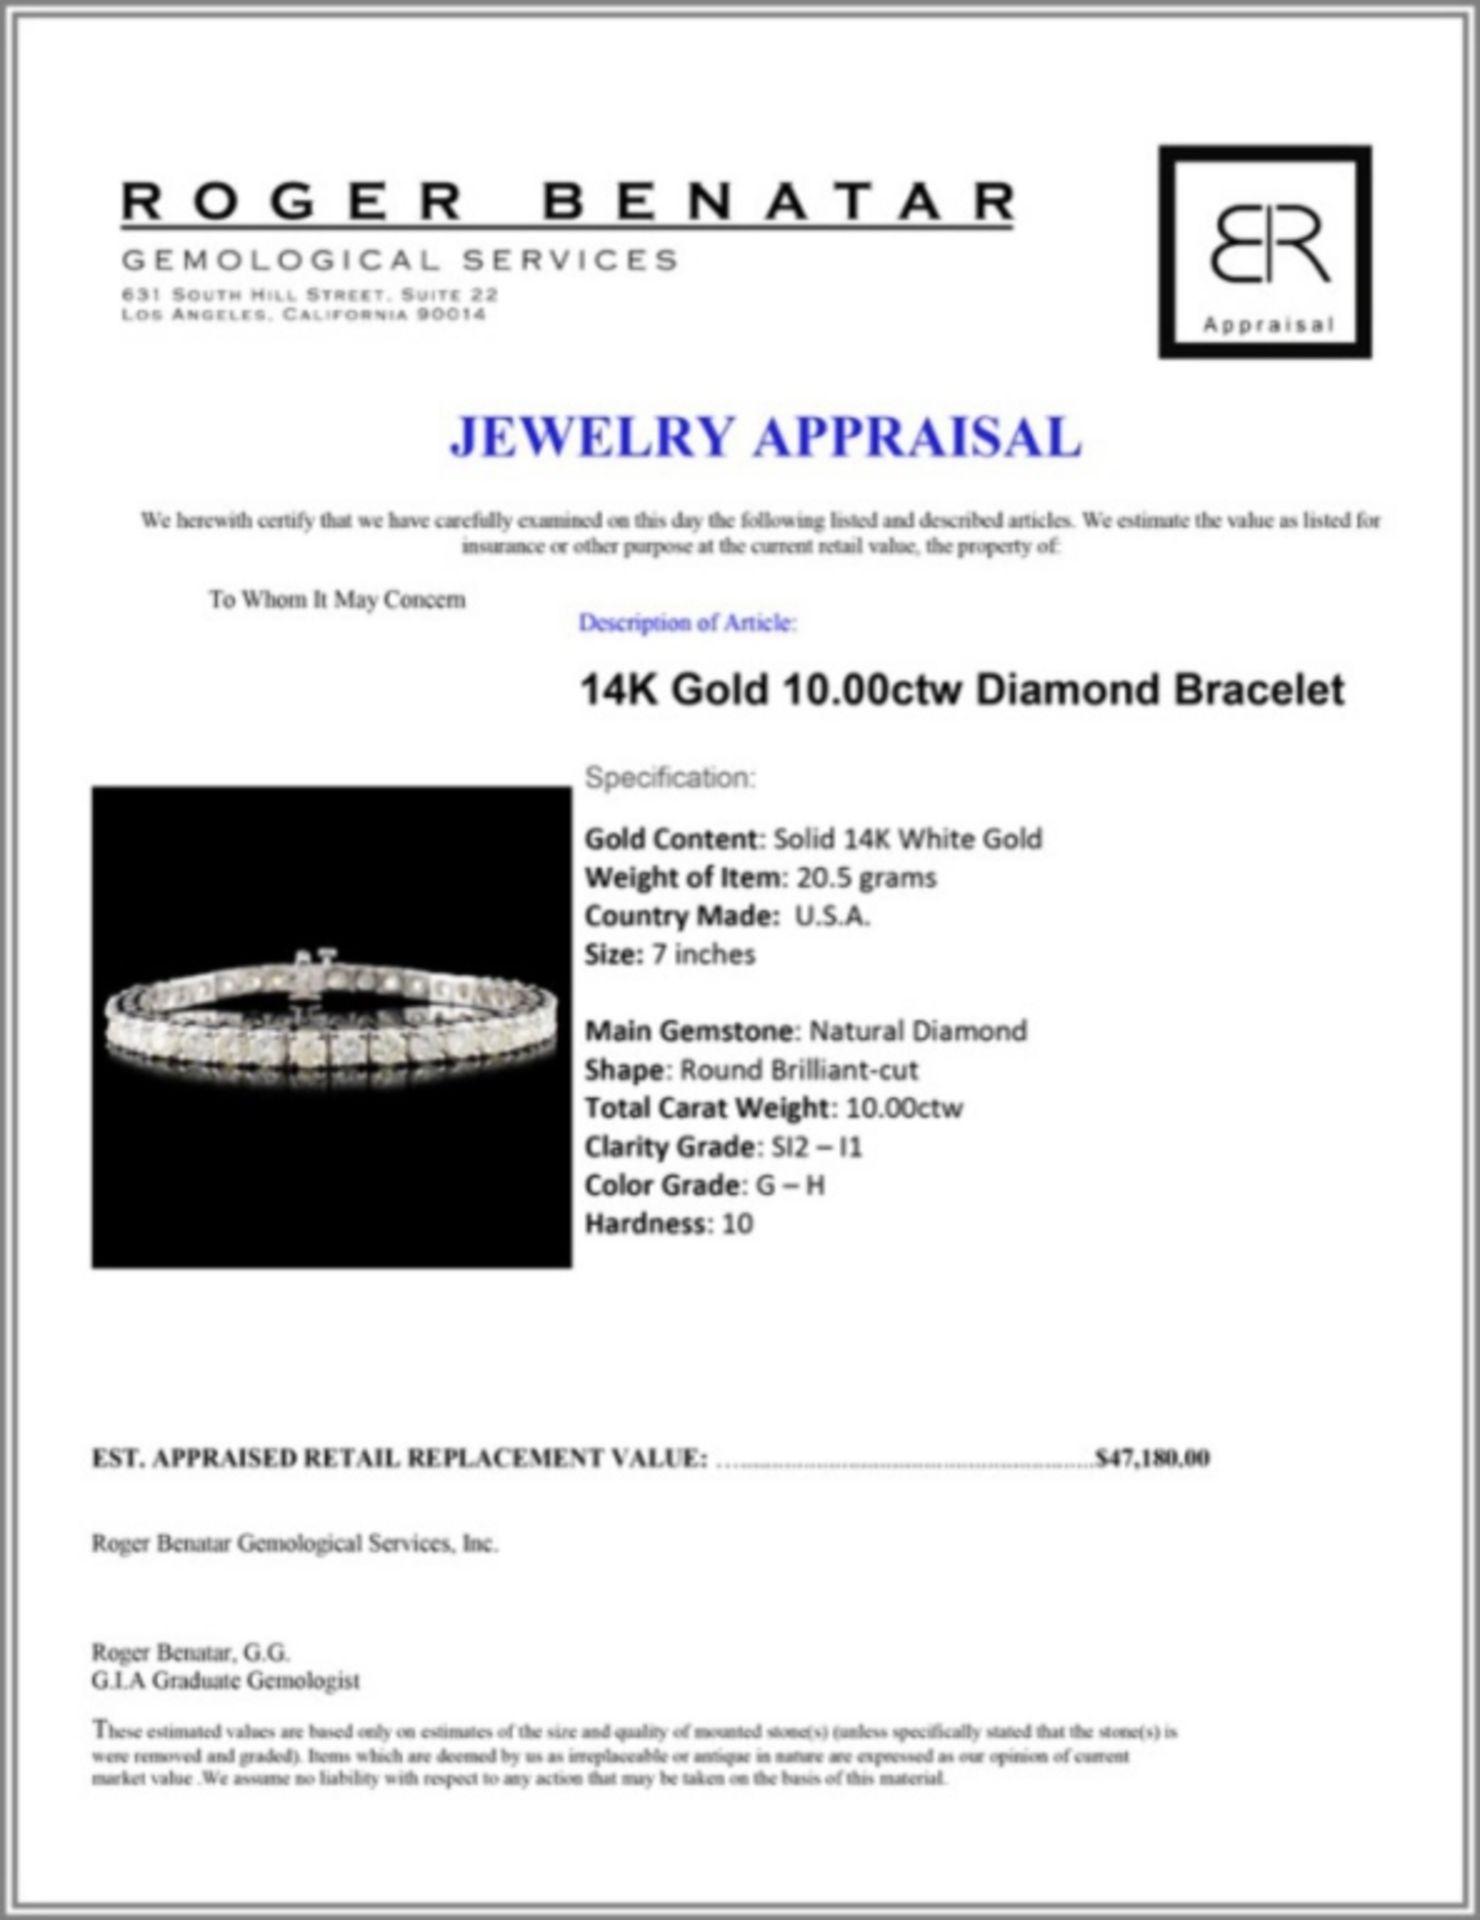 14K Gold 10.00ctw Diamond Bracelet - Image 3 of 3